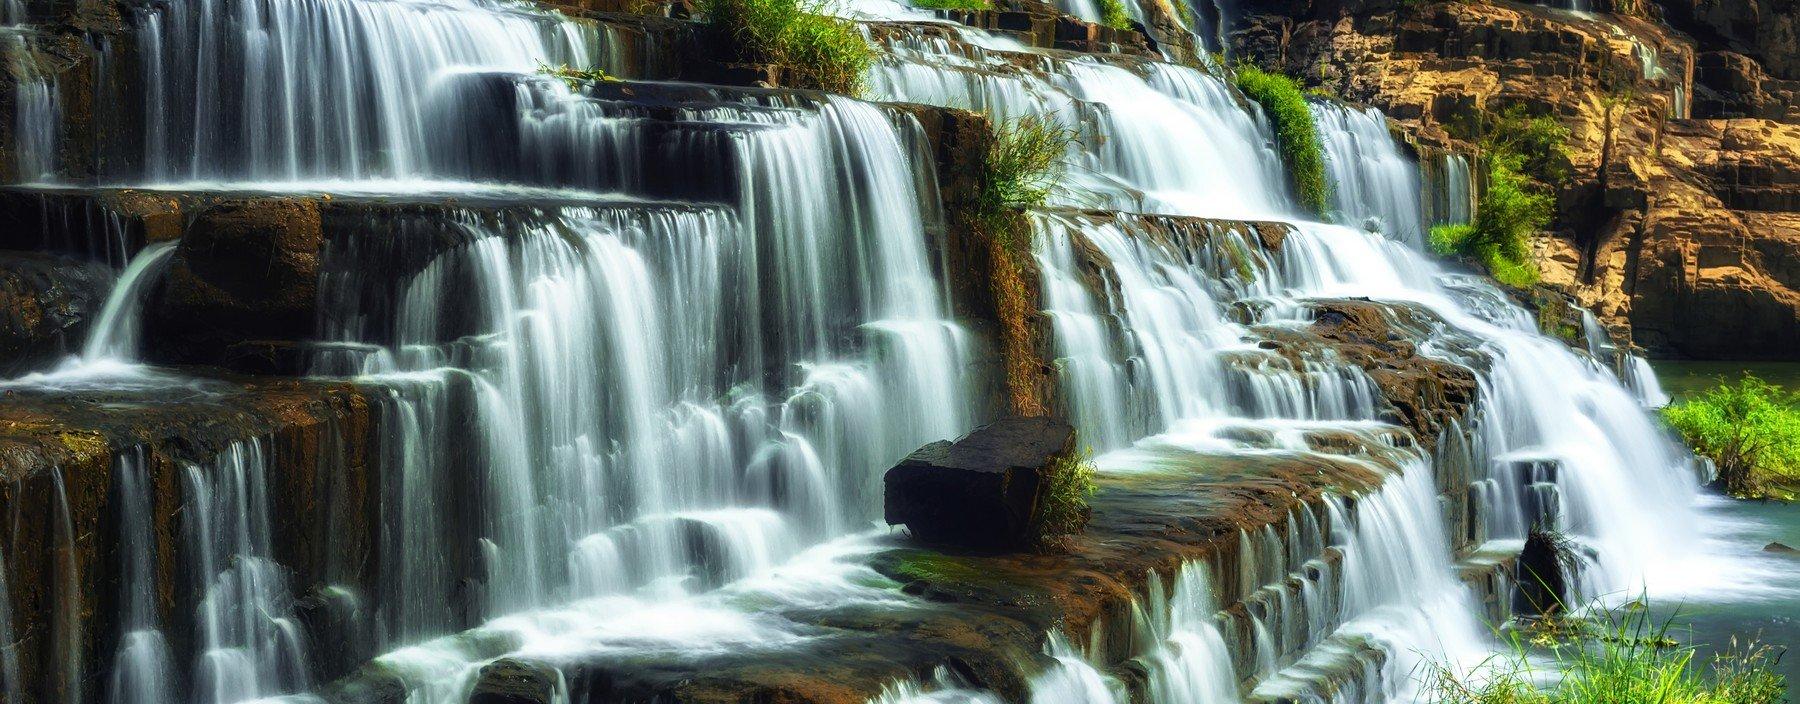 vn, dalat, pongour waterval.jpg